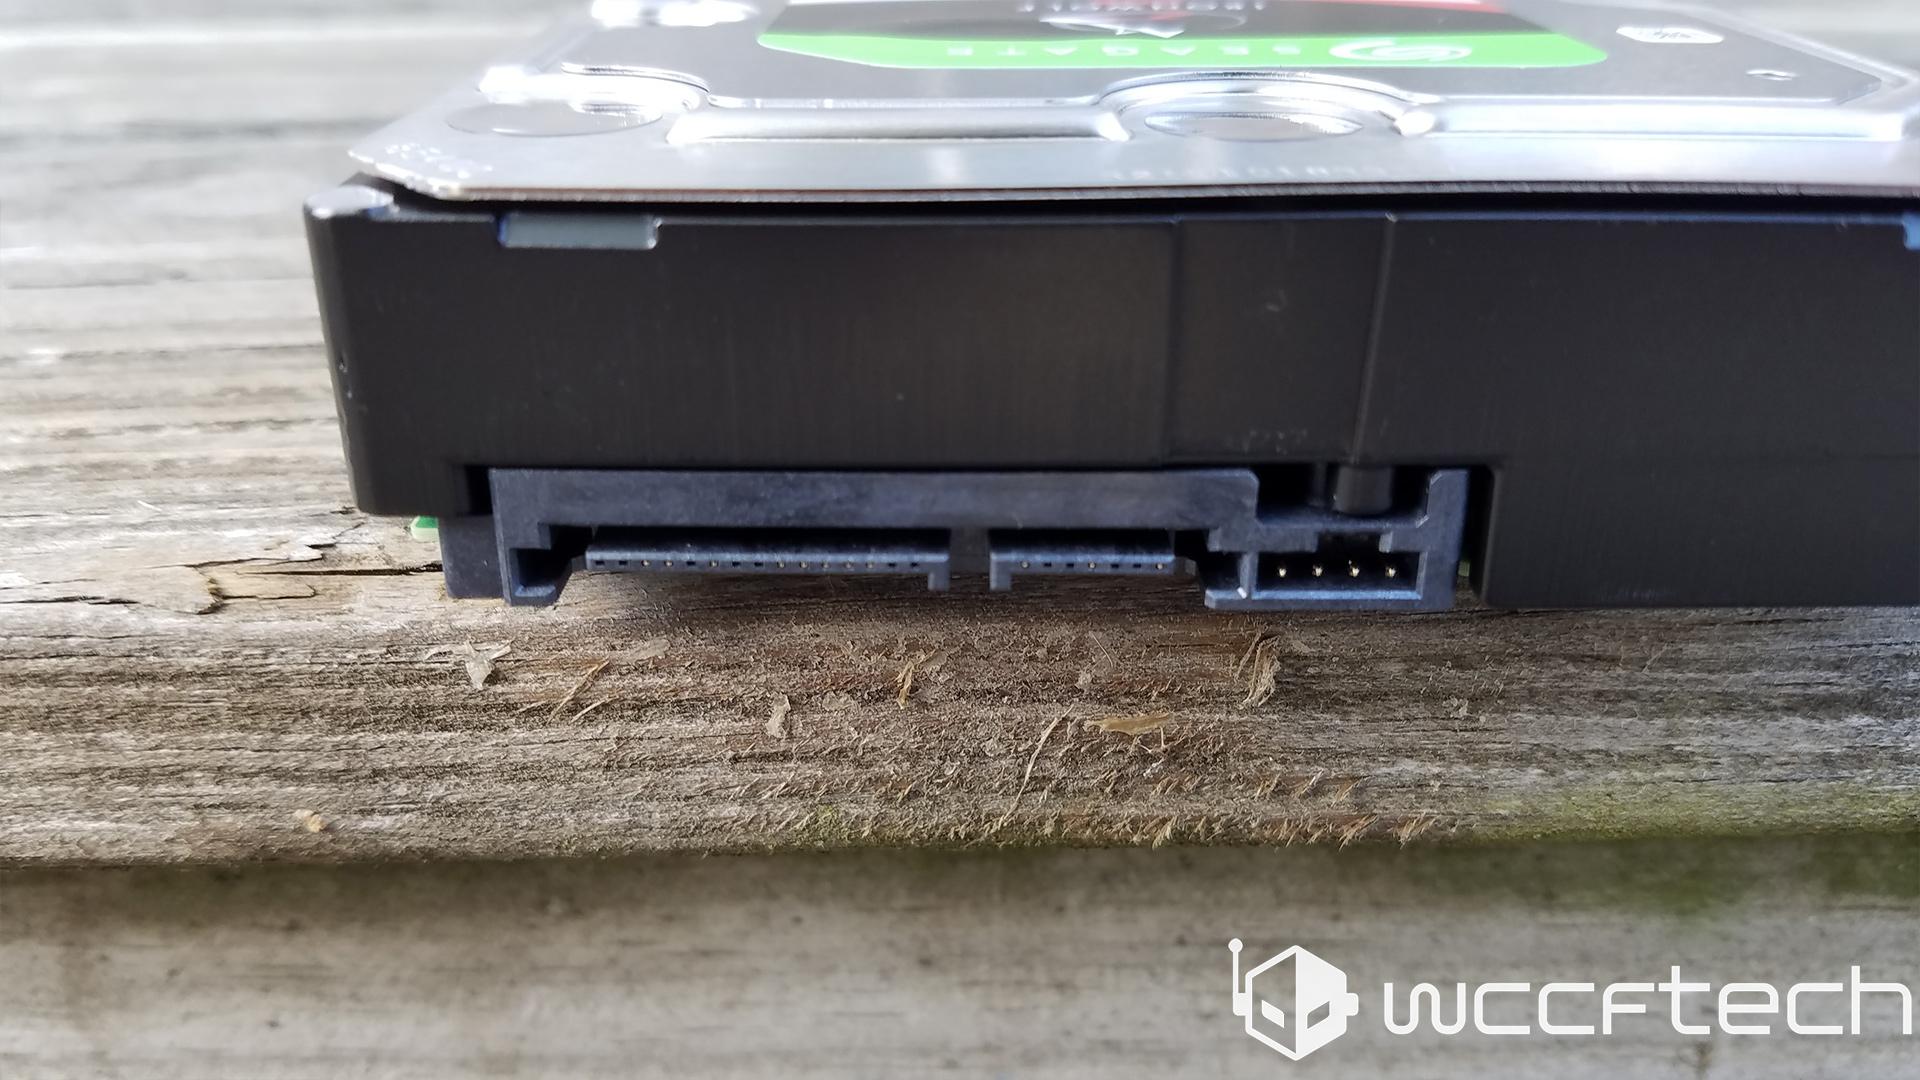 wccftech-seagate-ironwolf-6tb-4